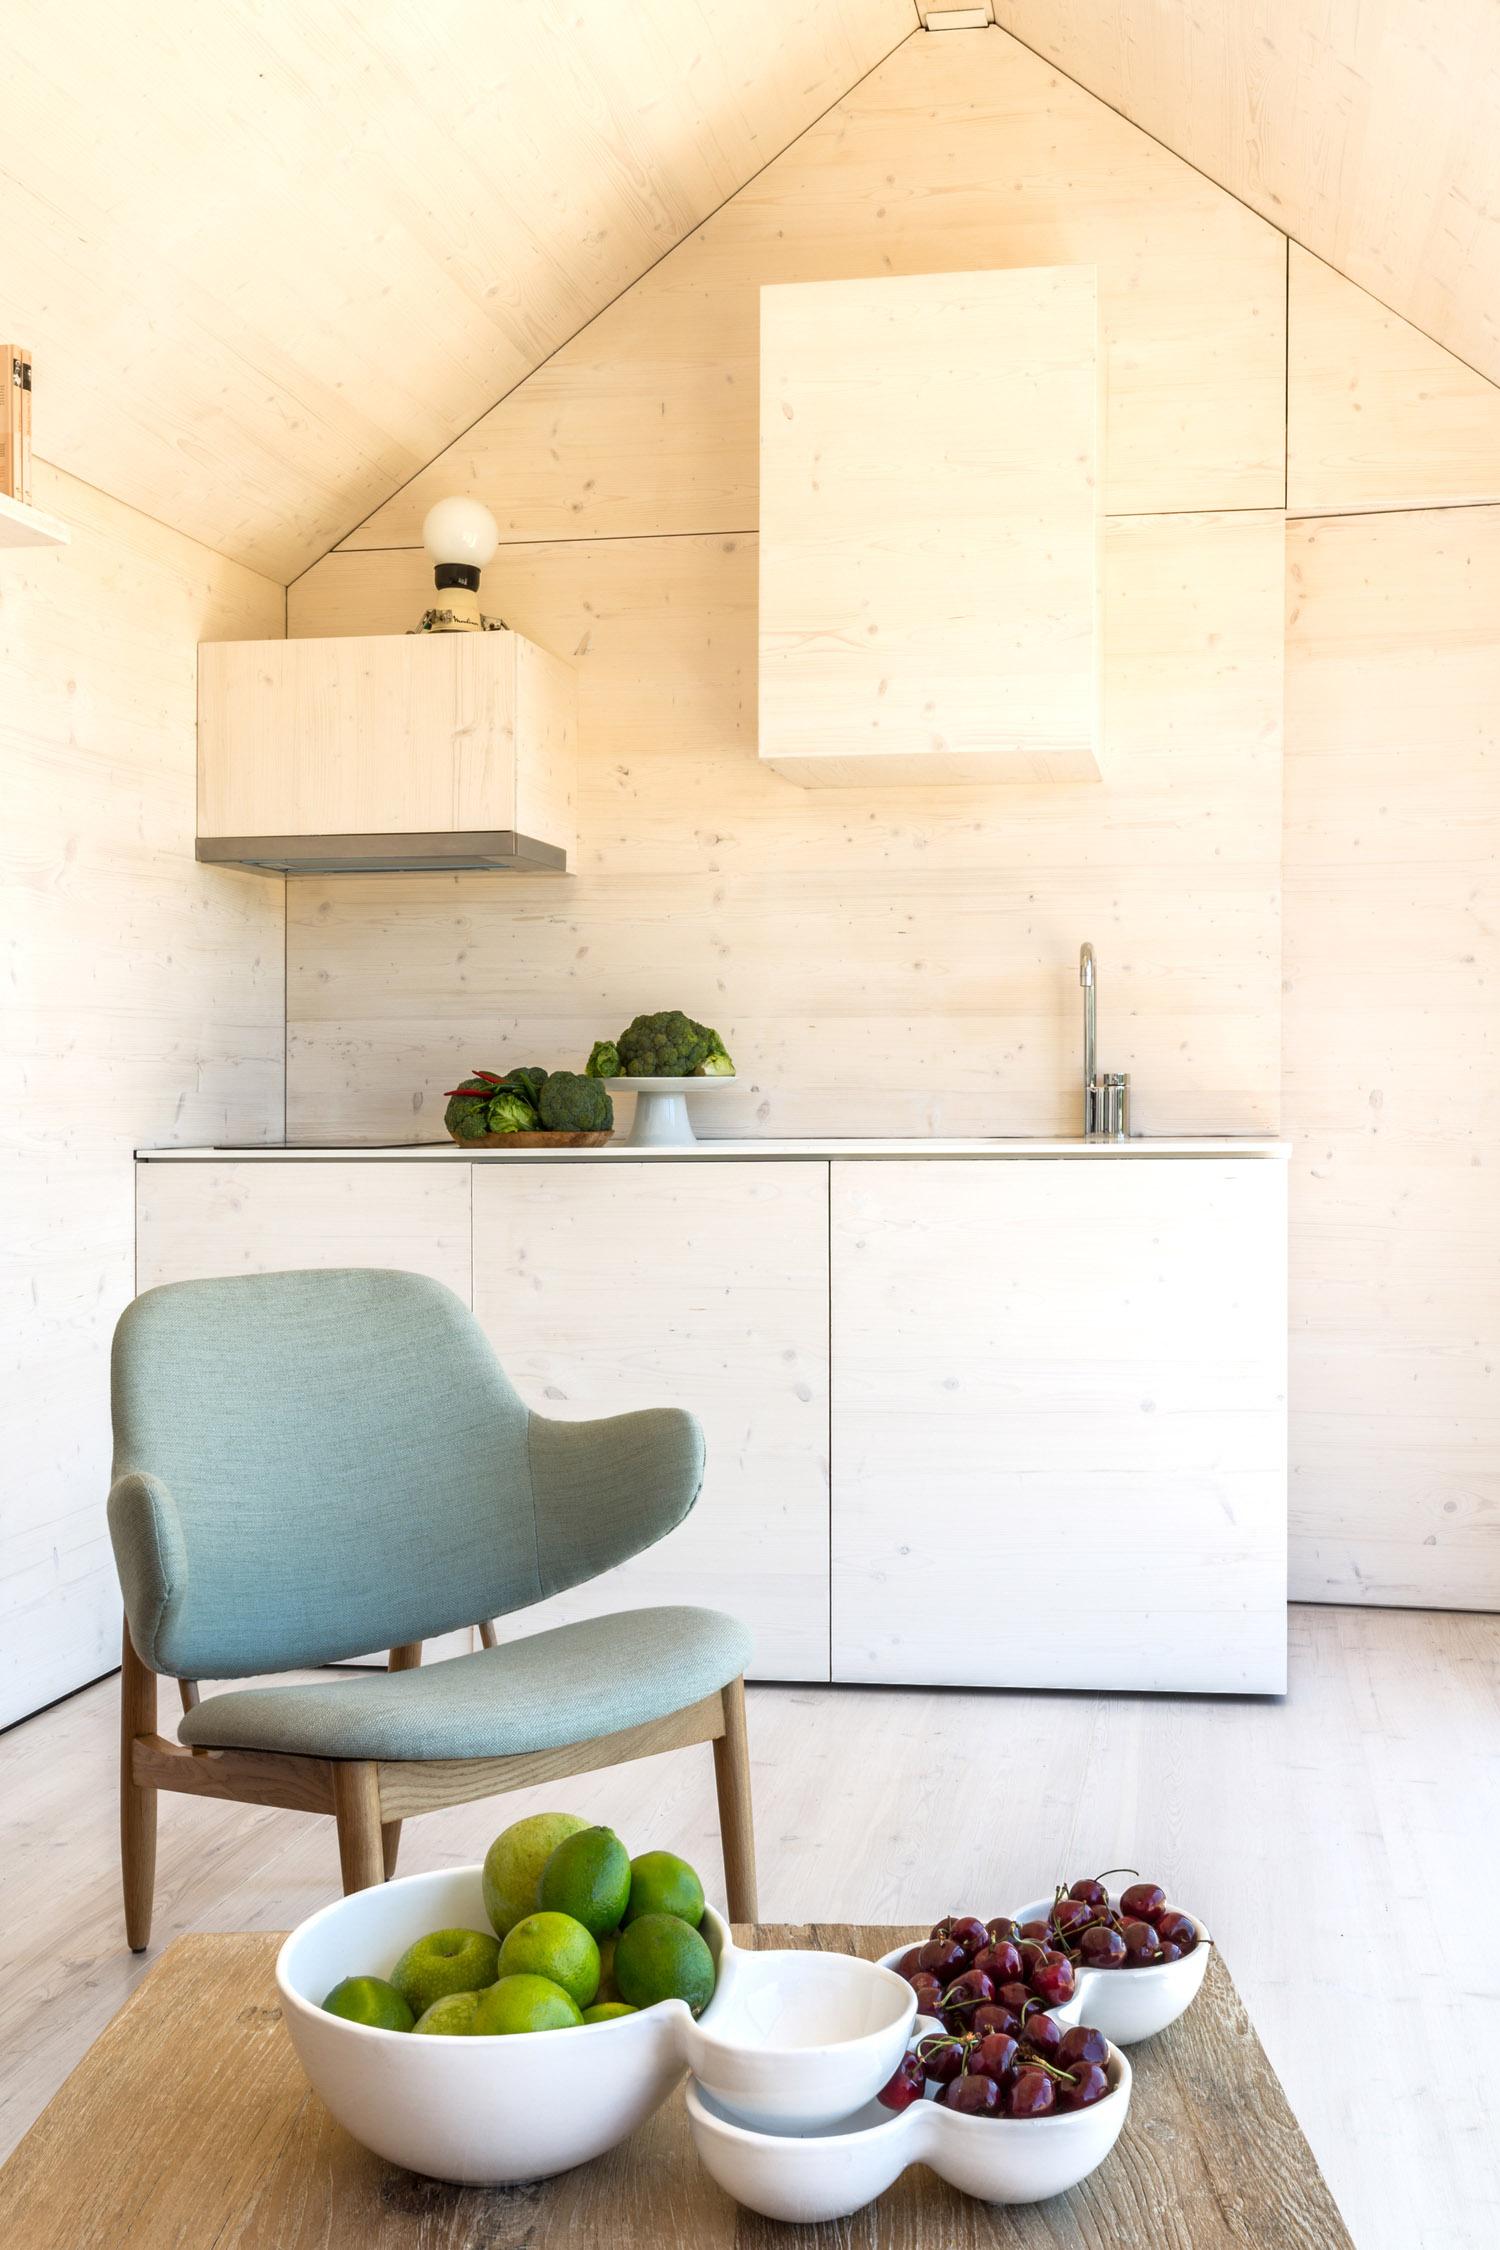 Portable home by architecture studio ÁBATON 13